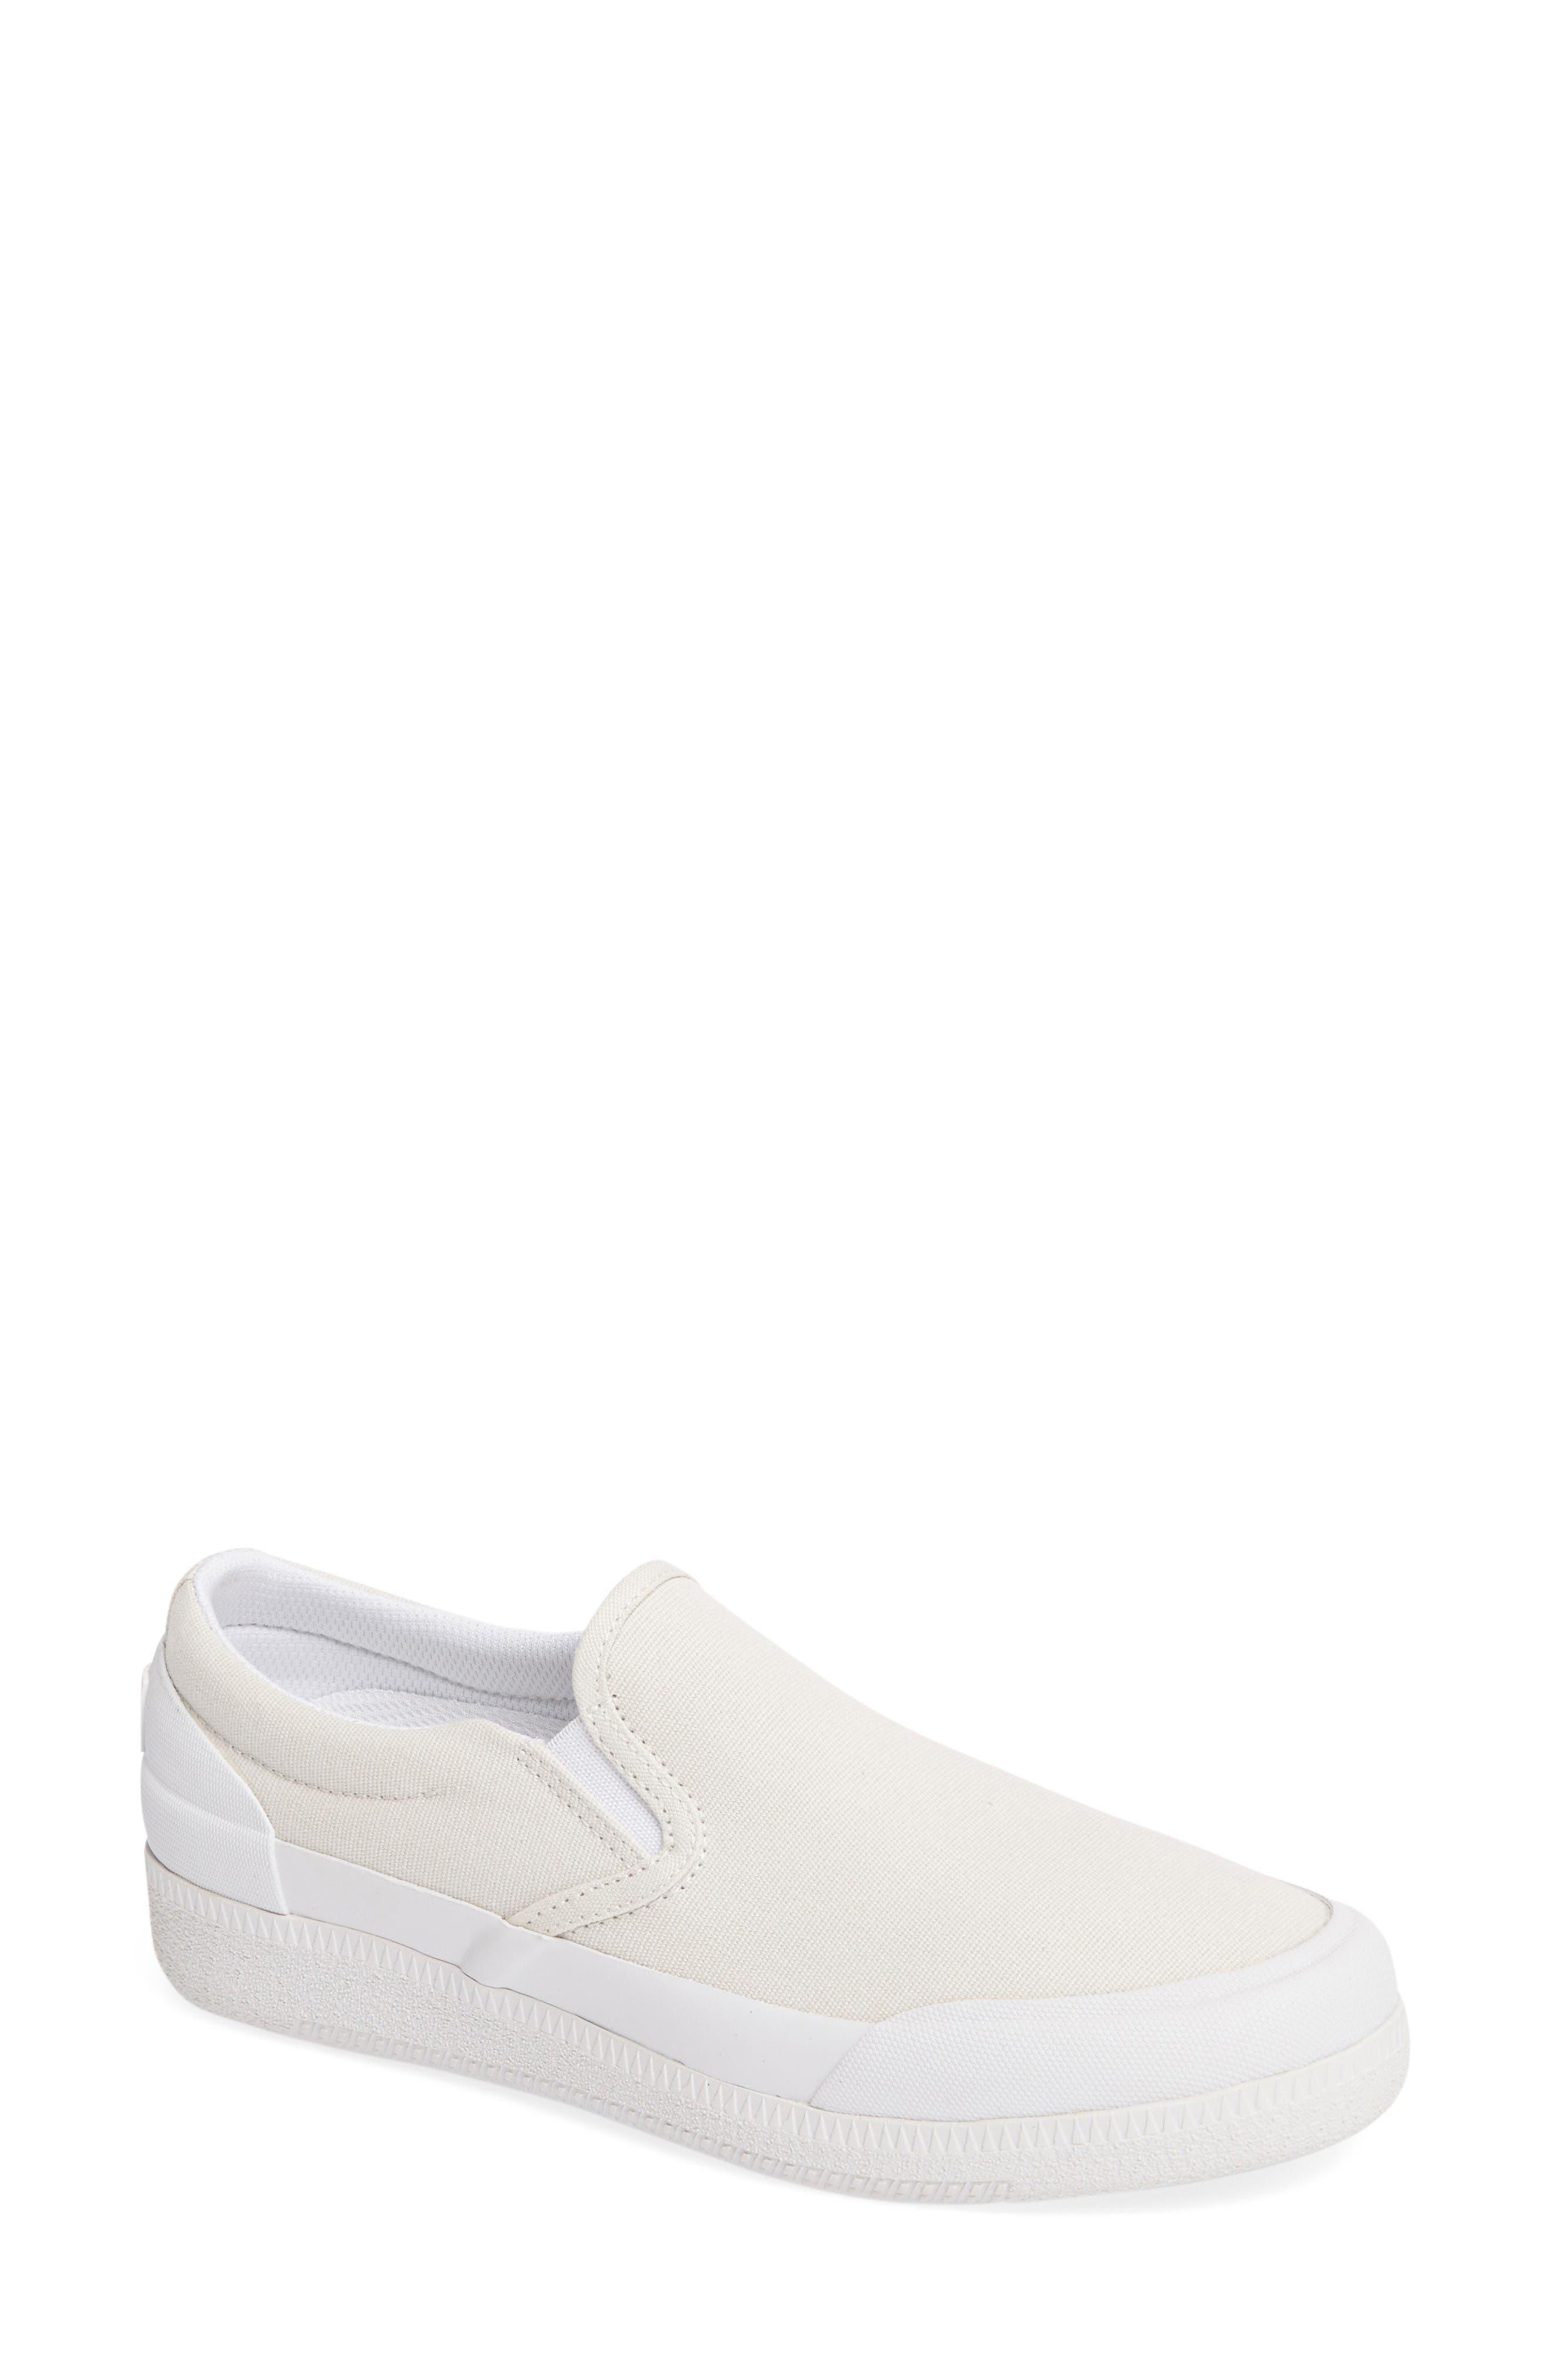 Hunter Original Waterproof Slip-On Sneaker (Women)